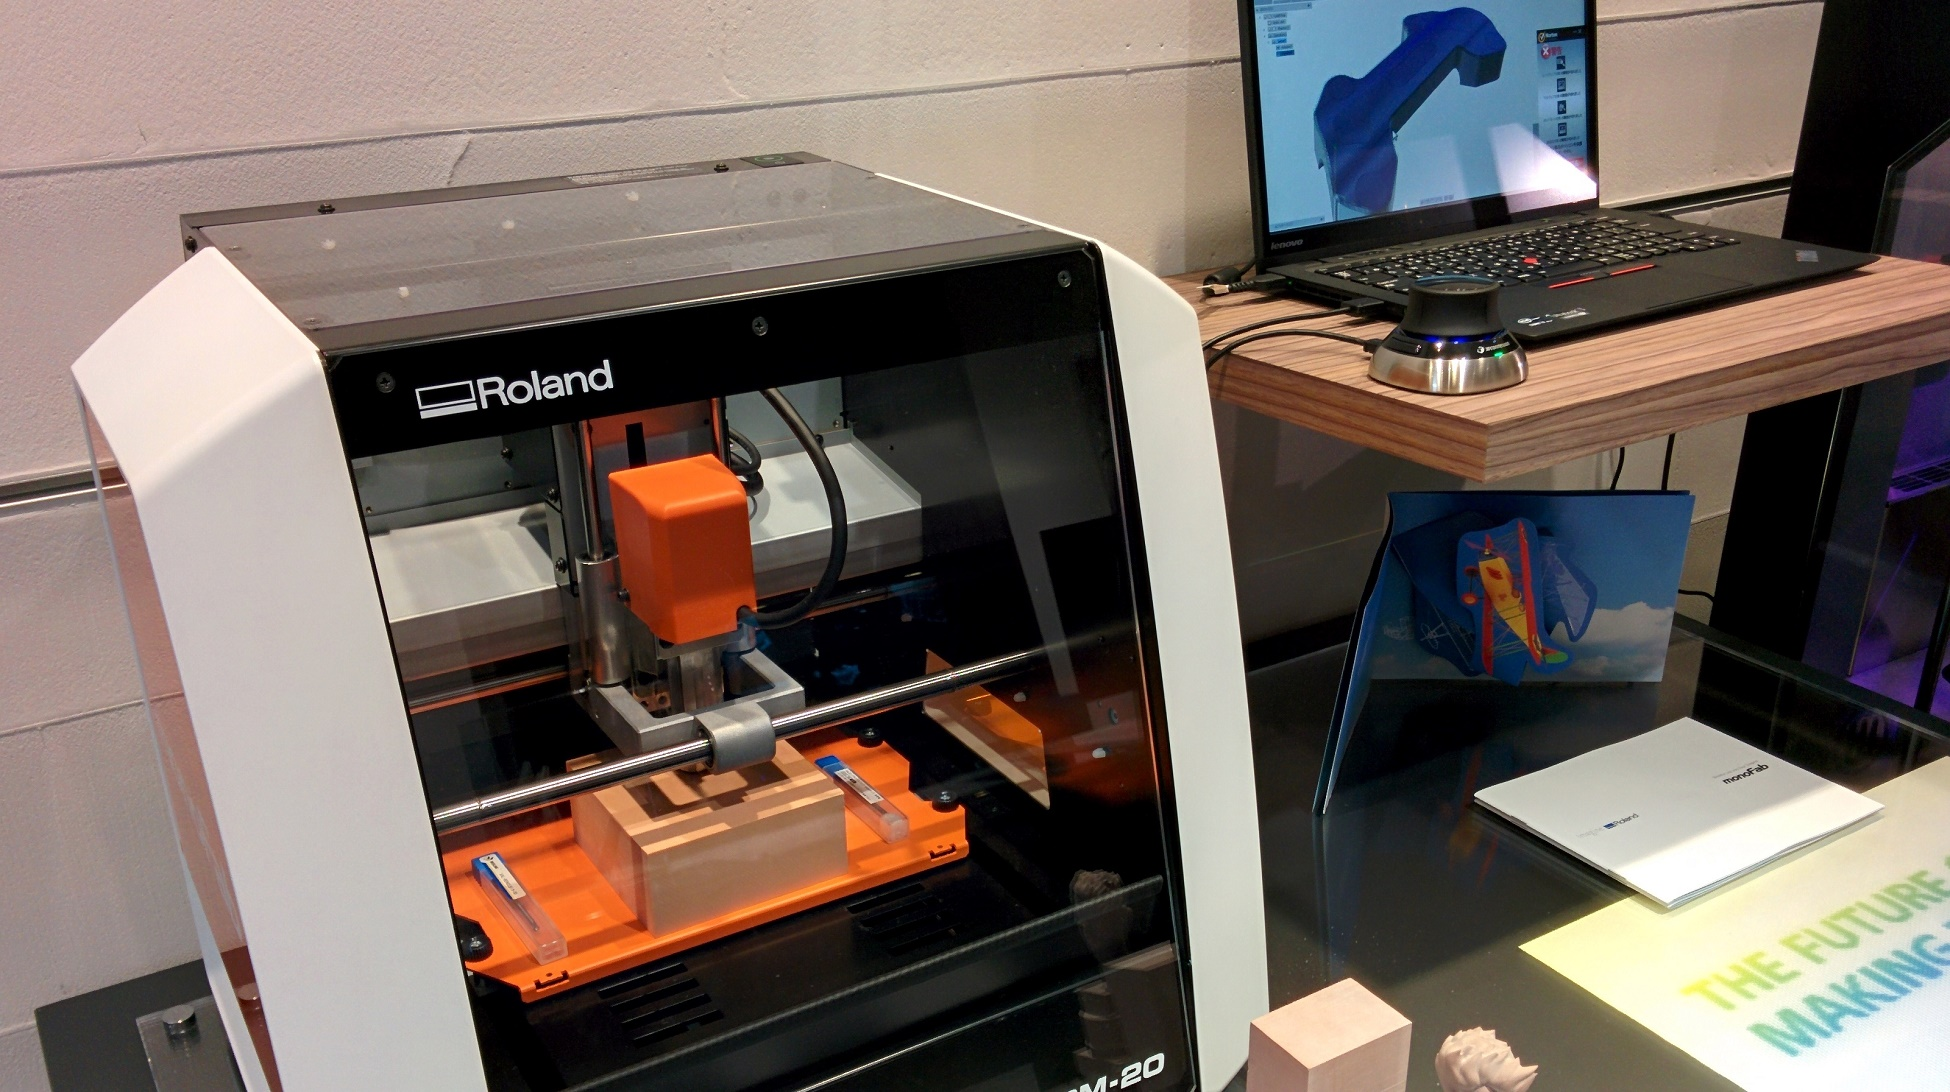 Este proceso de impresión 3D permite crear robots directamente